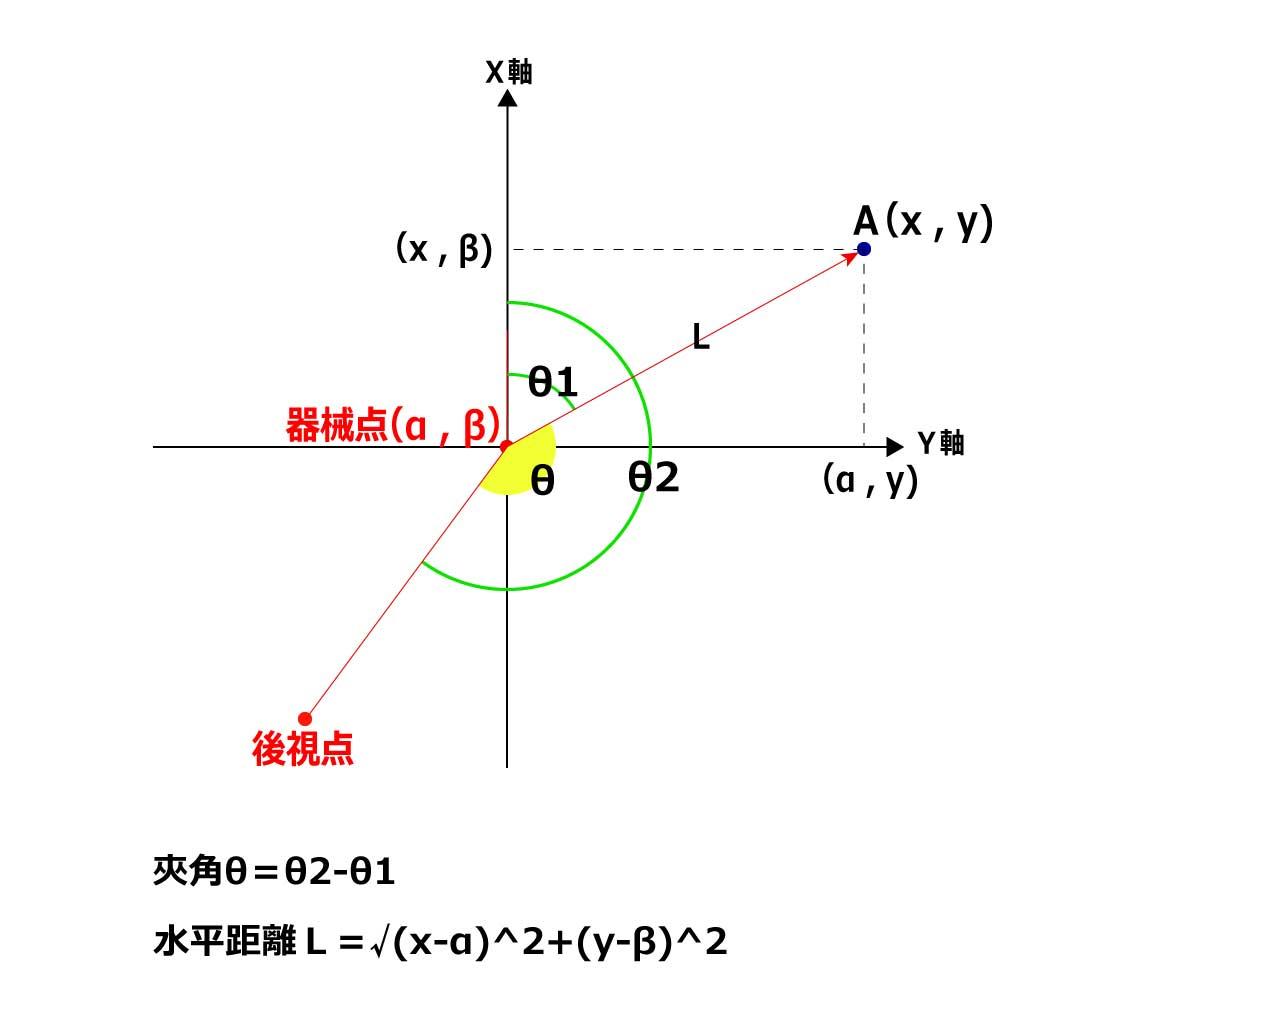 測量計算(方向角と水平距離)